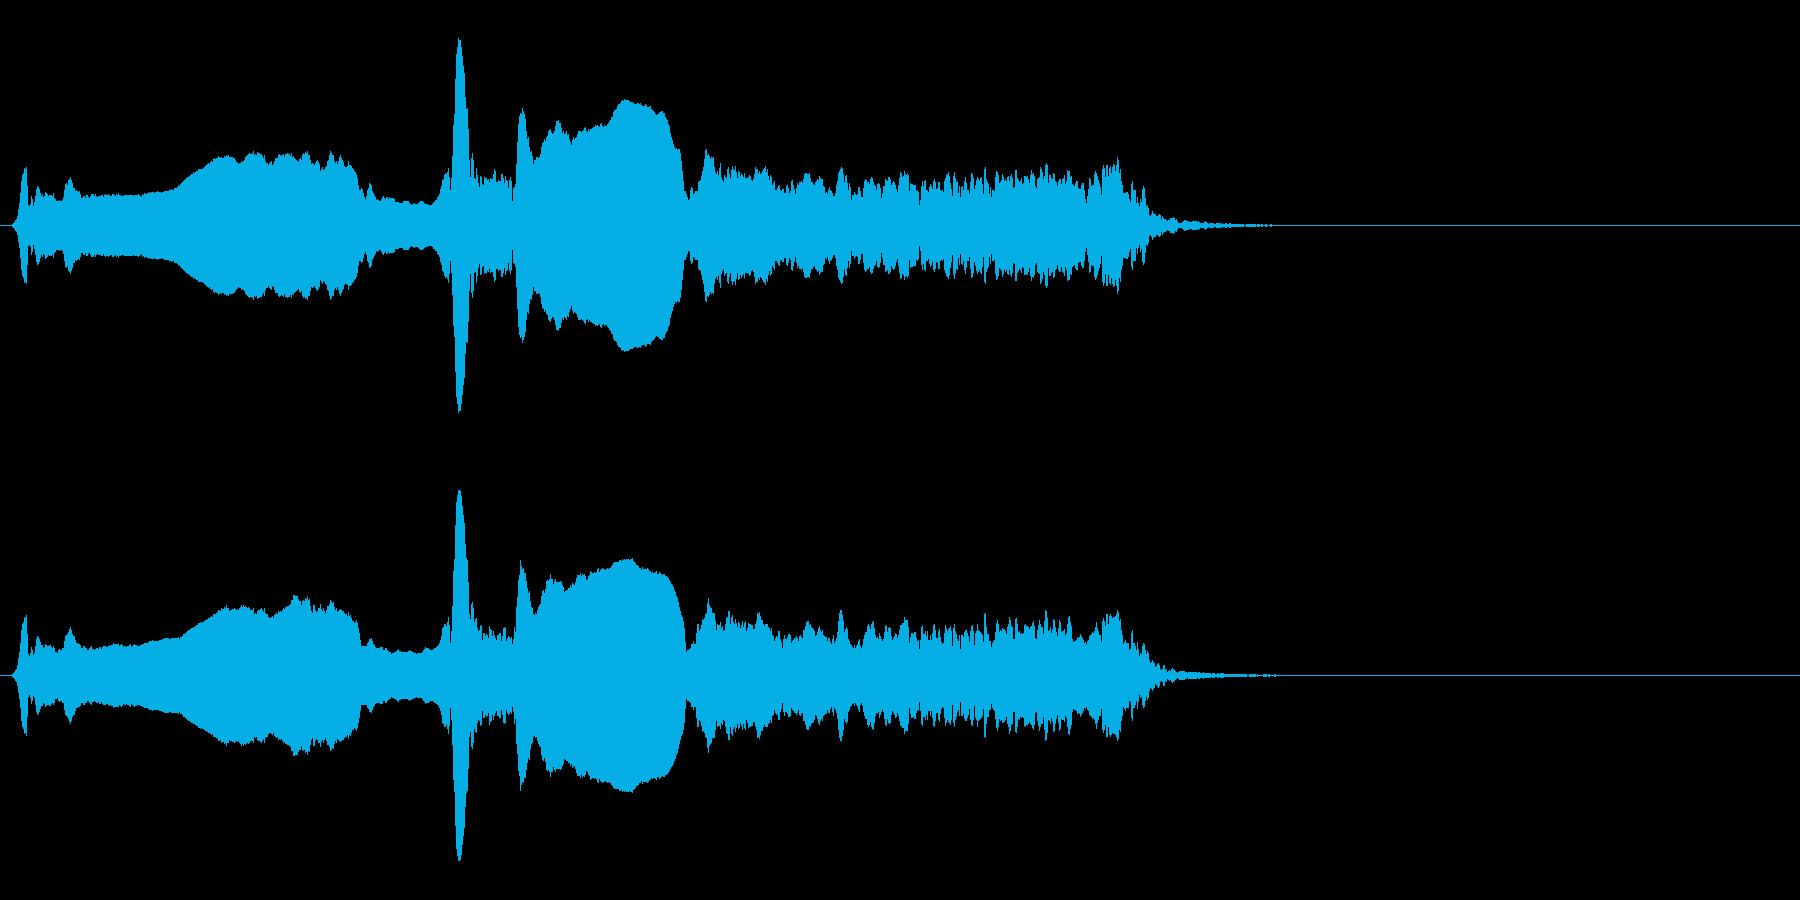 尺八 生演奏 古典風 残響音有 #7の再生済みの波形